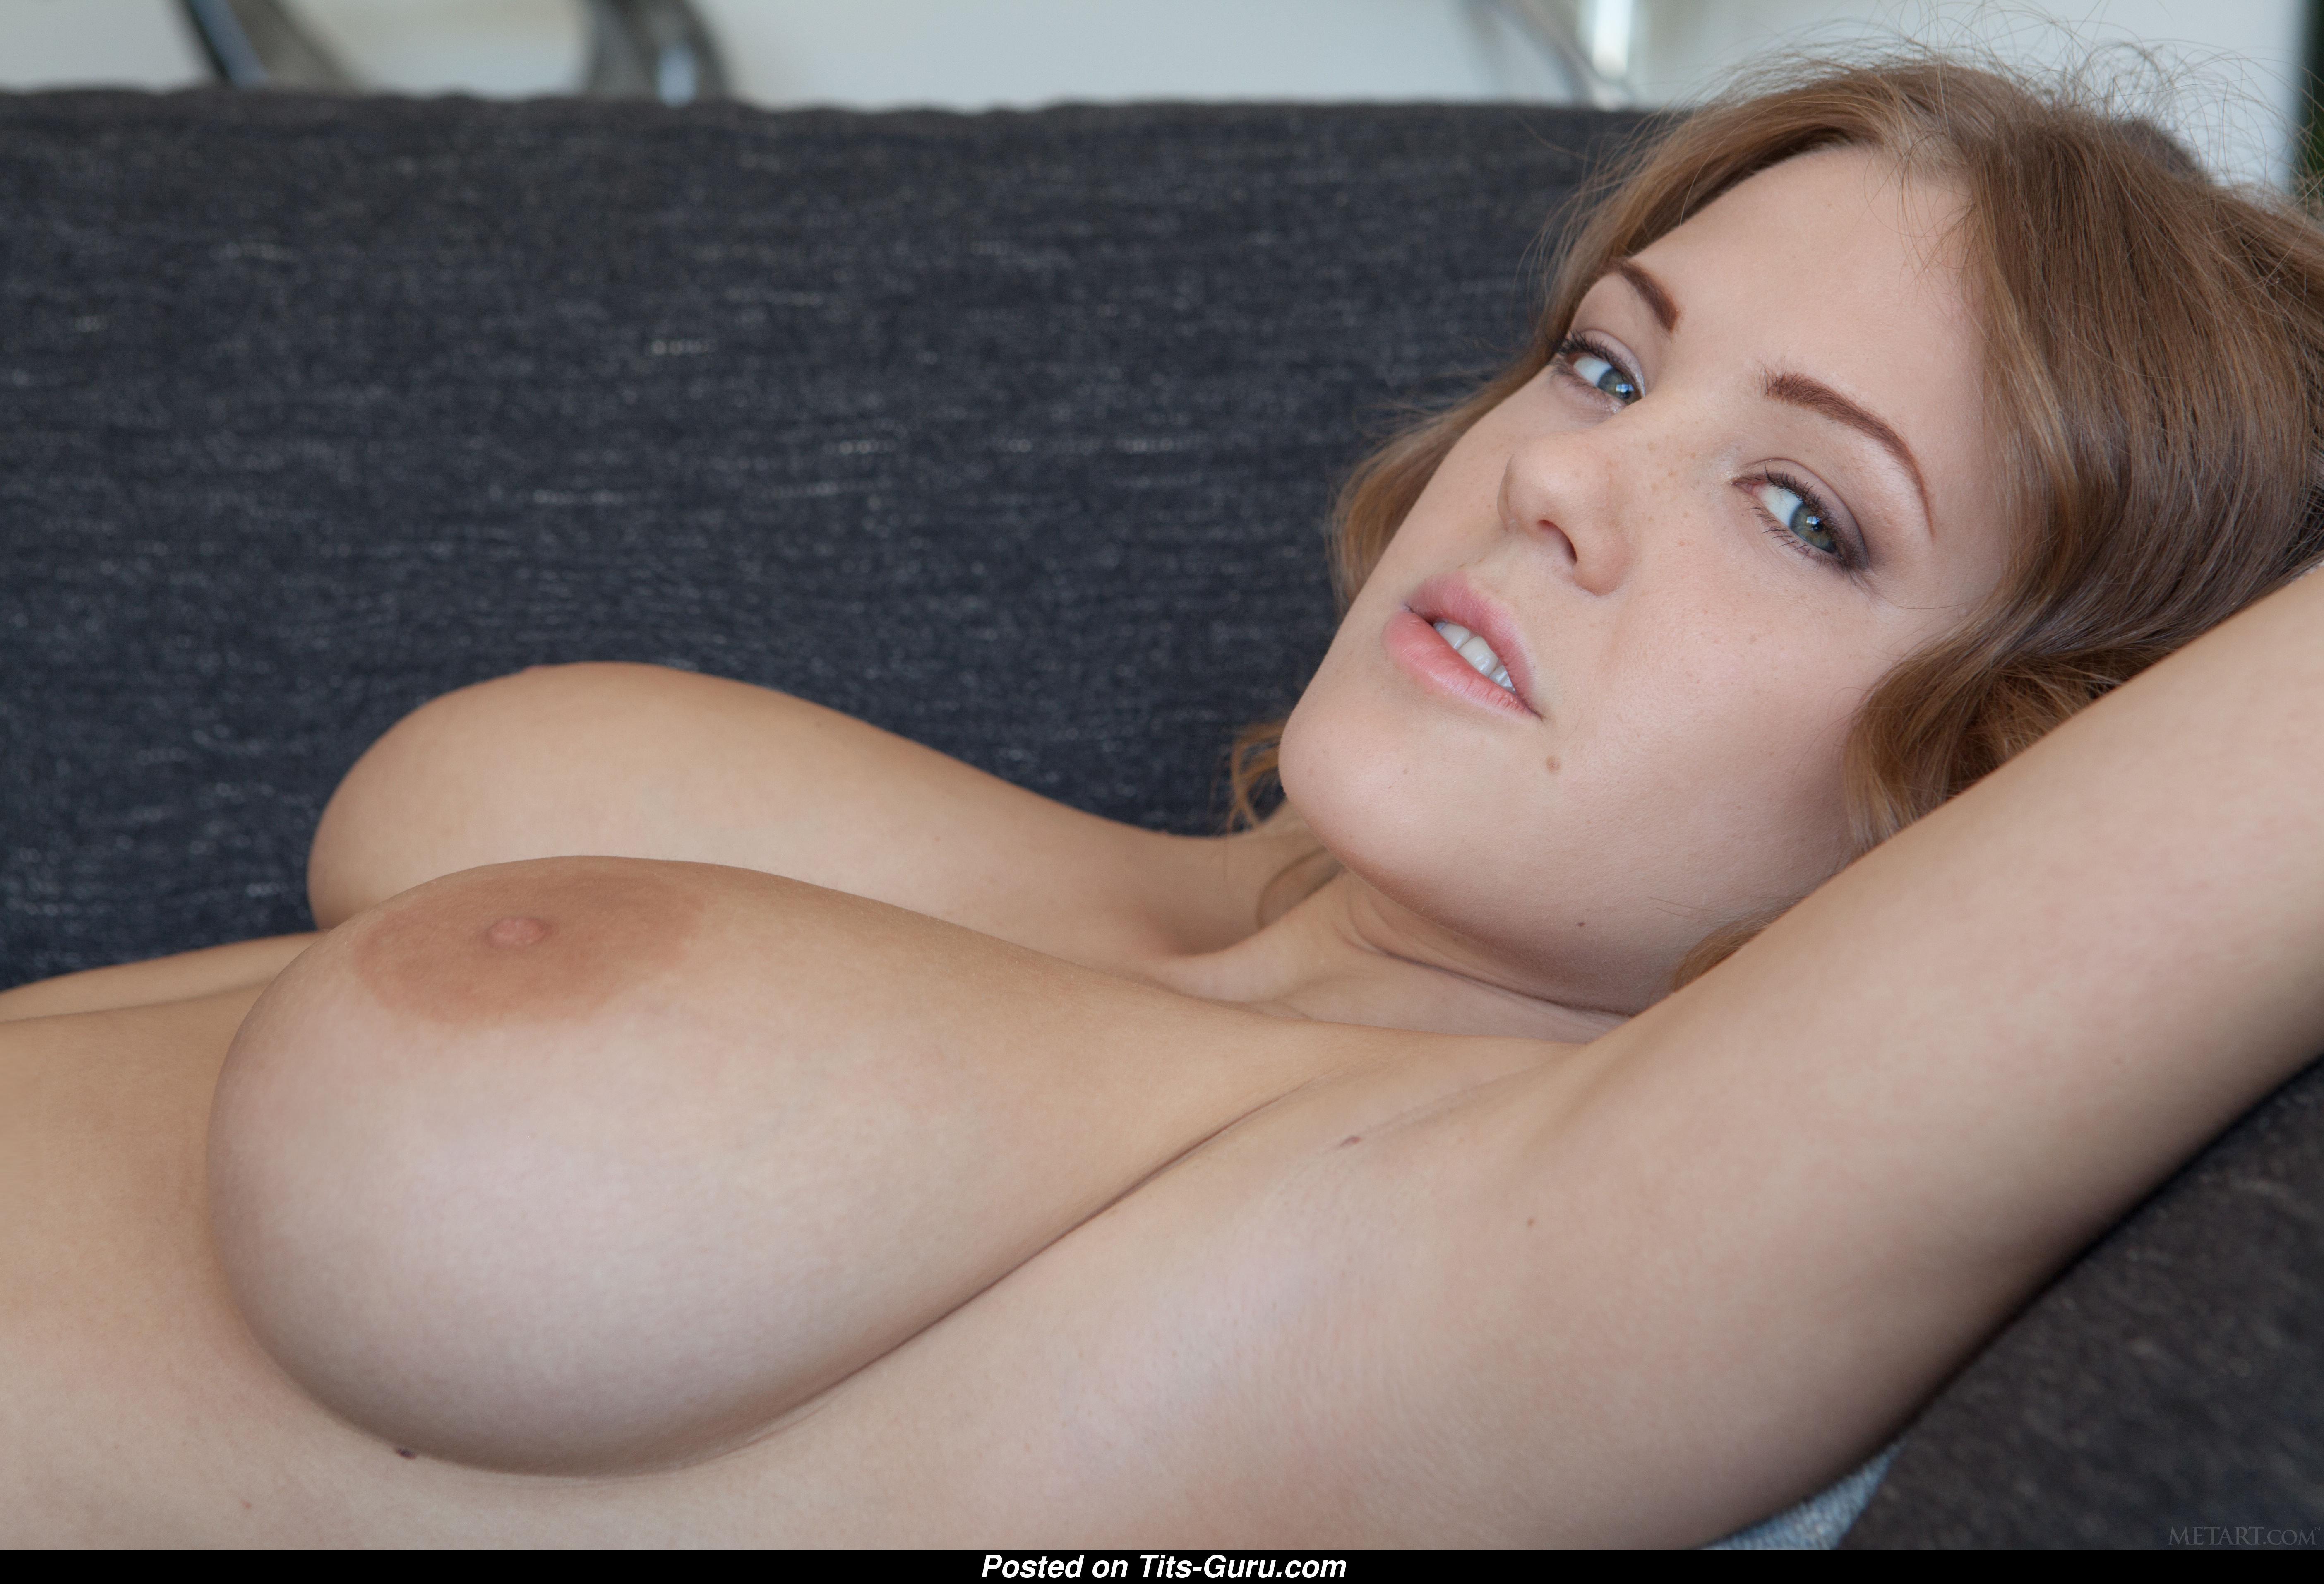 Nude white titties sexual